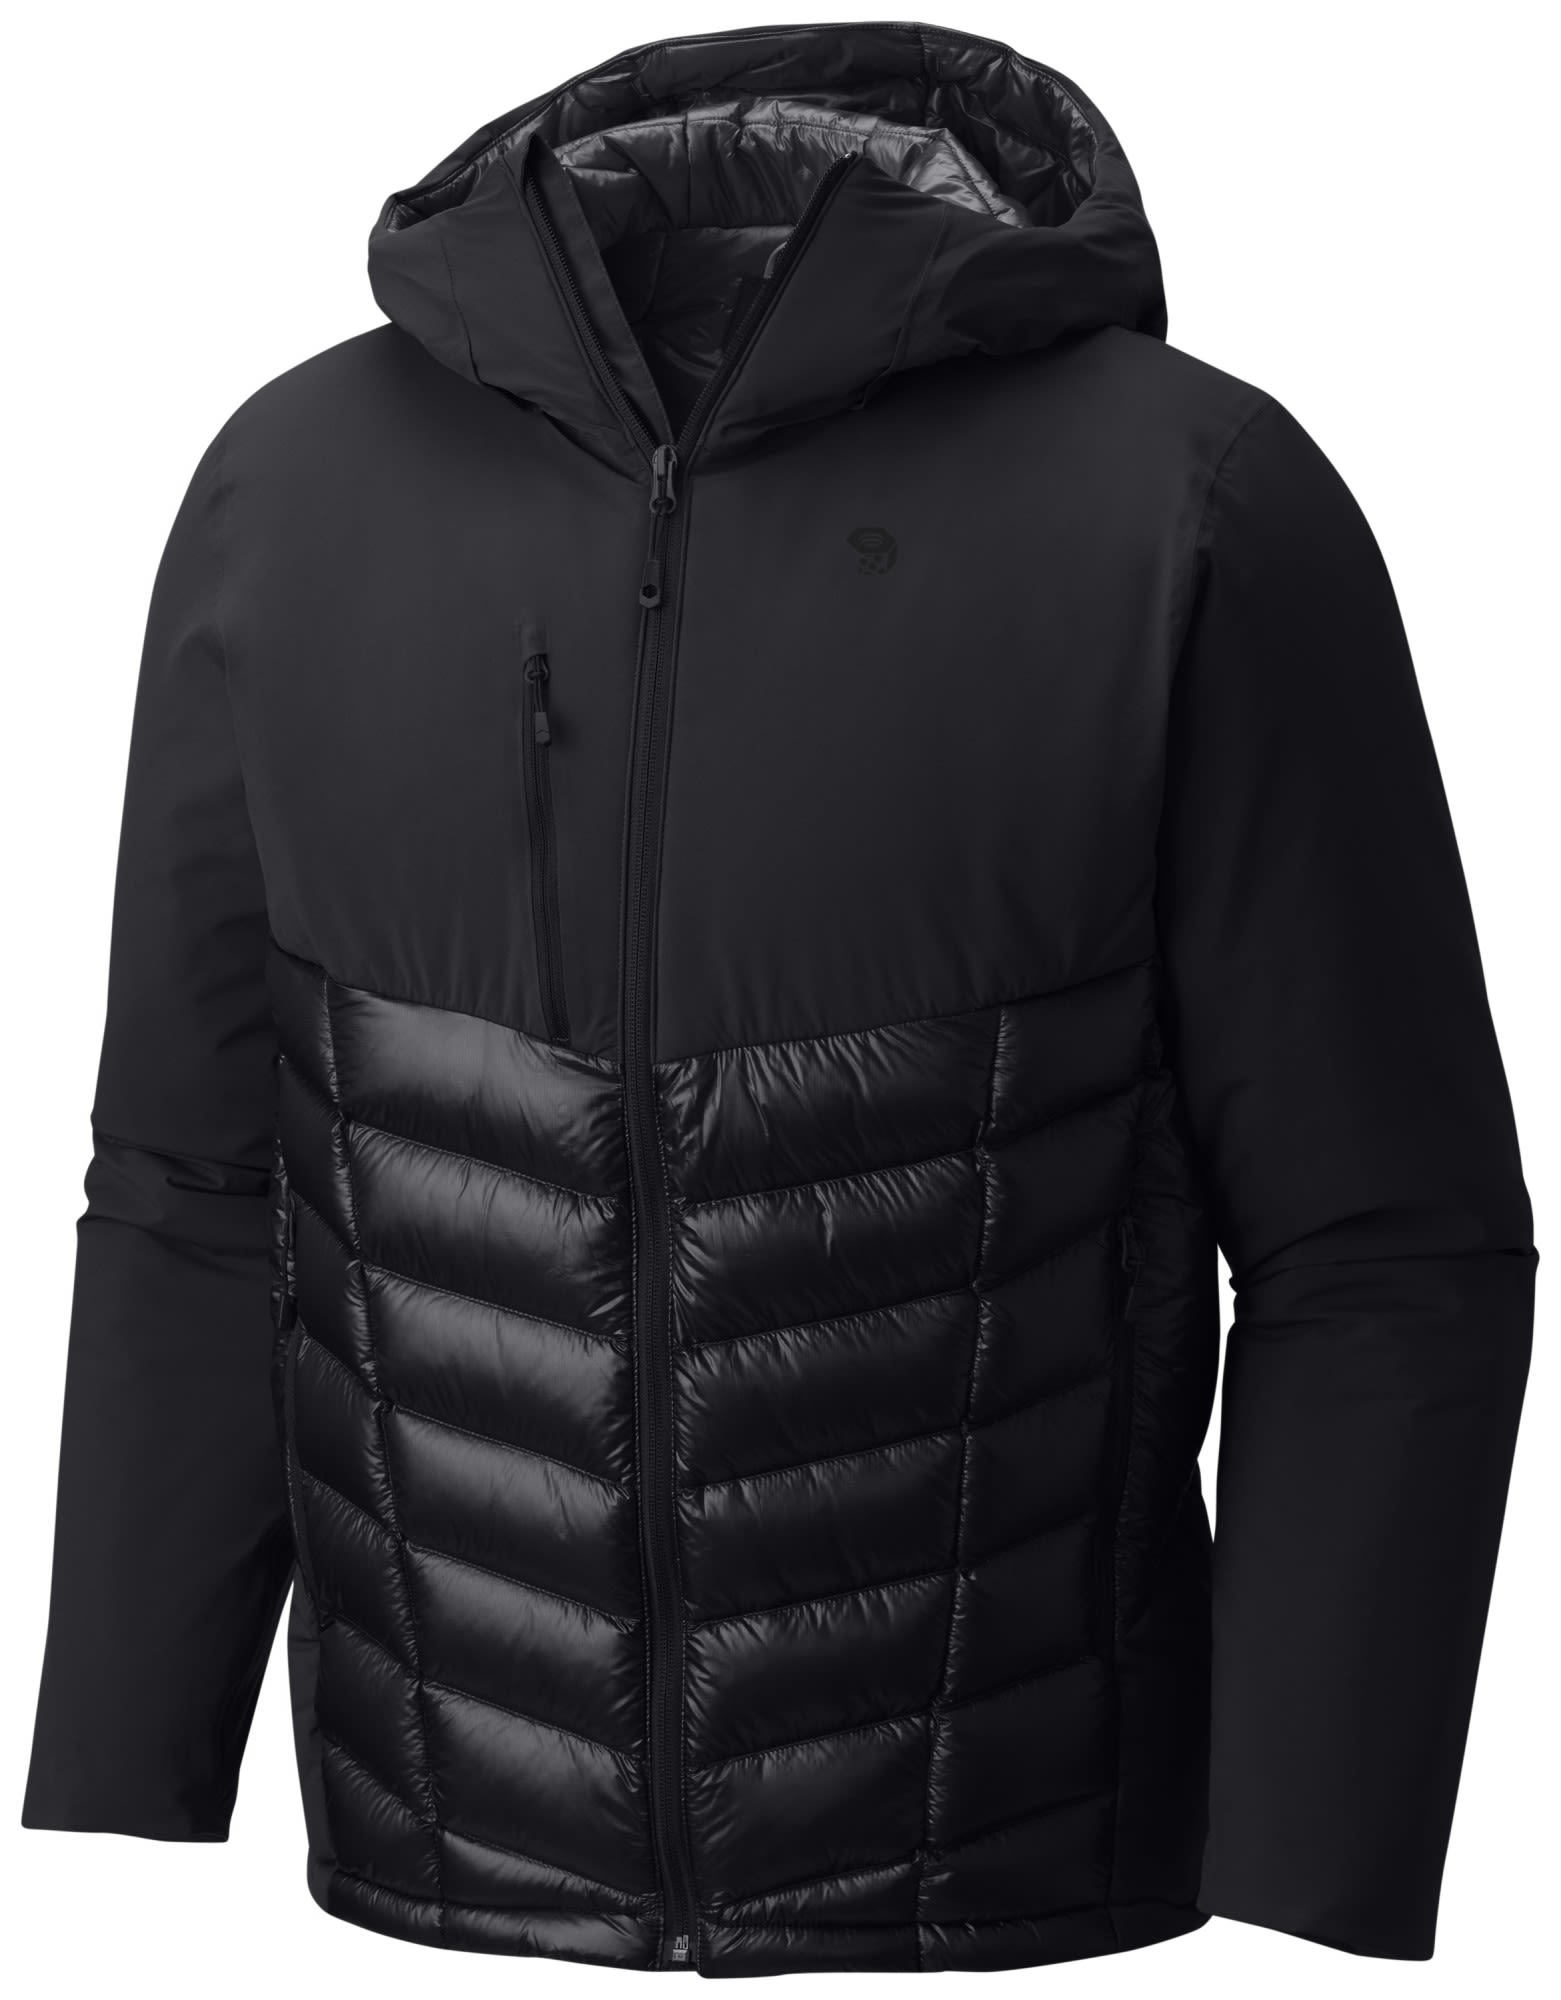 Mountain Hardwear M Supercharger Insulated Jacket | Herren Isolationsjacke